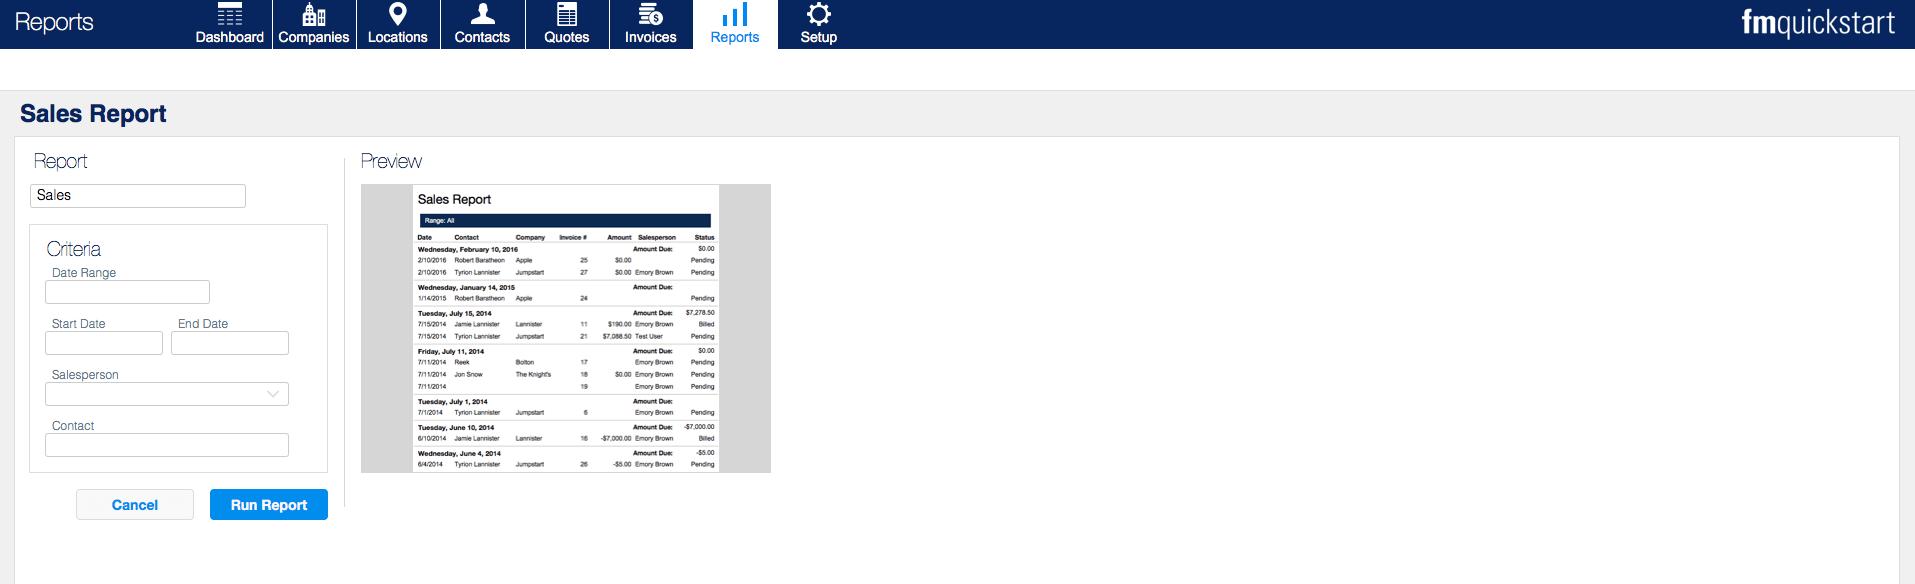 fm quickstart 17 reports